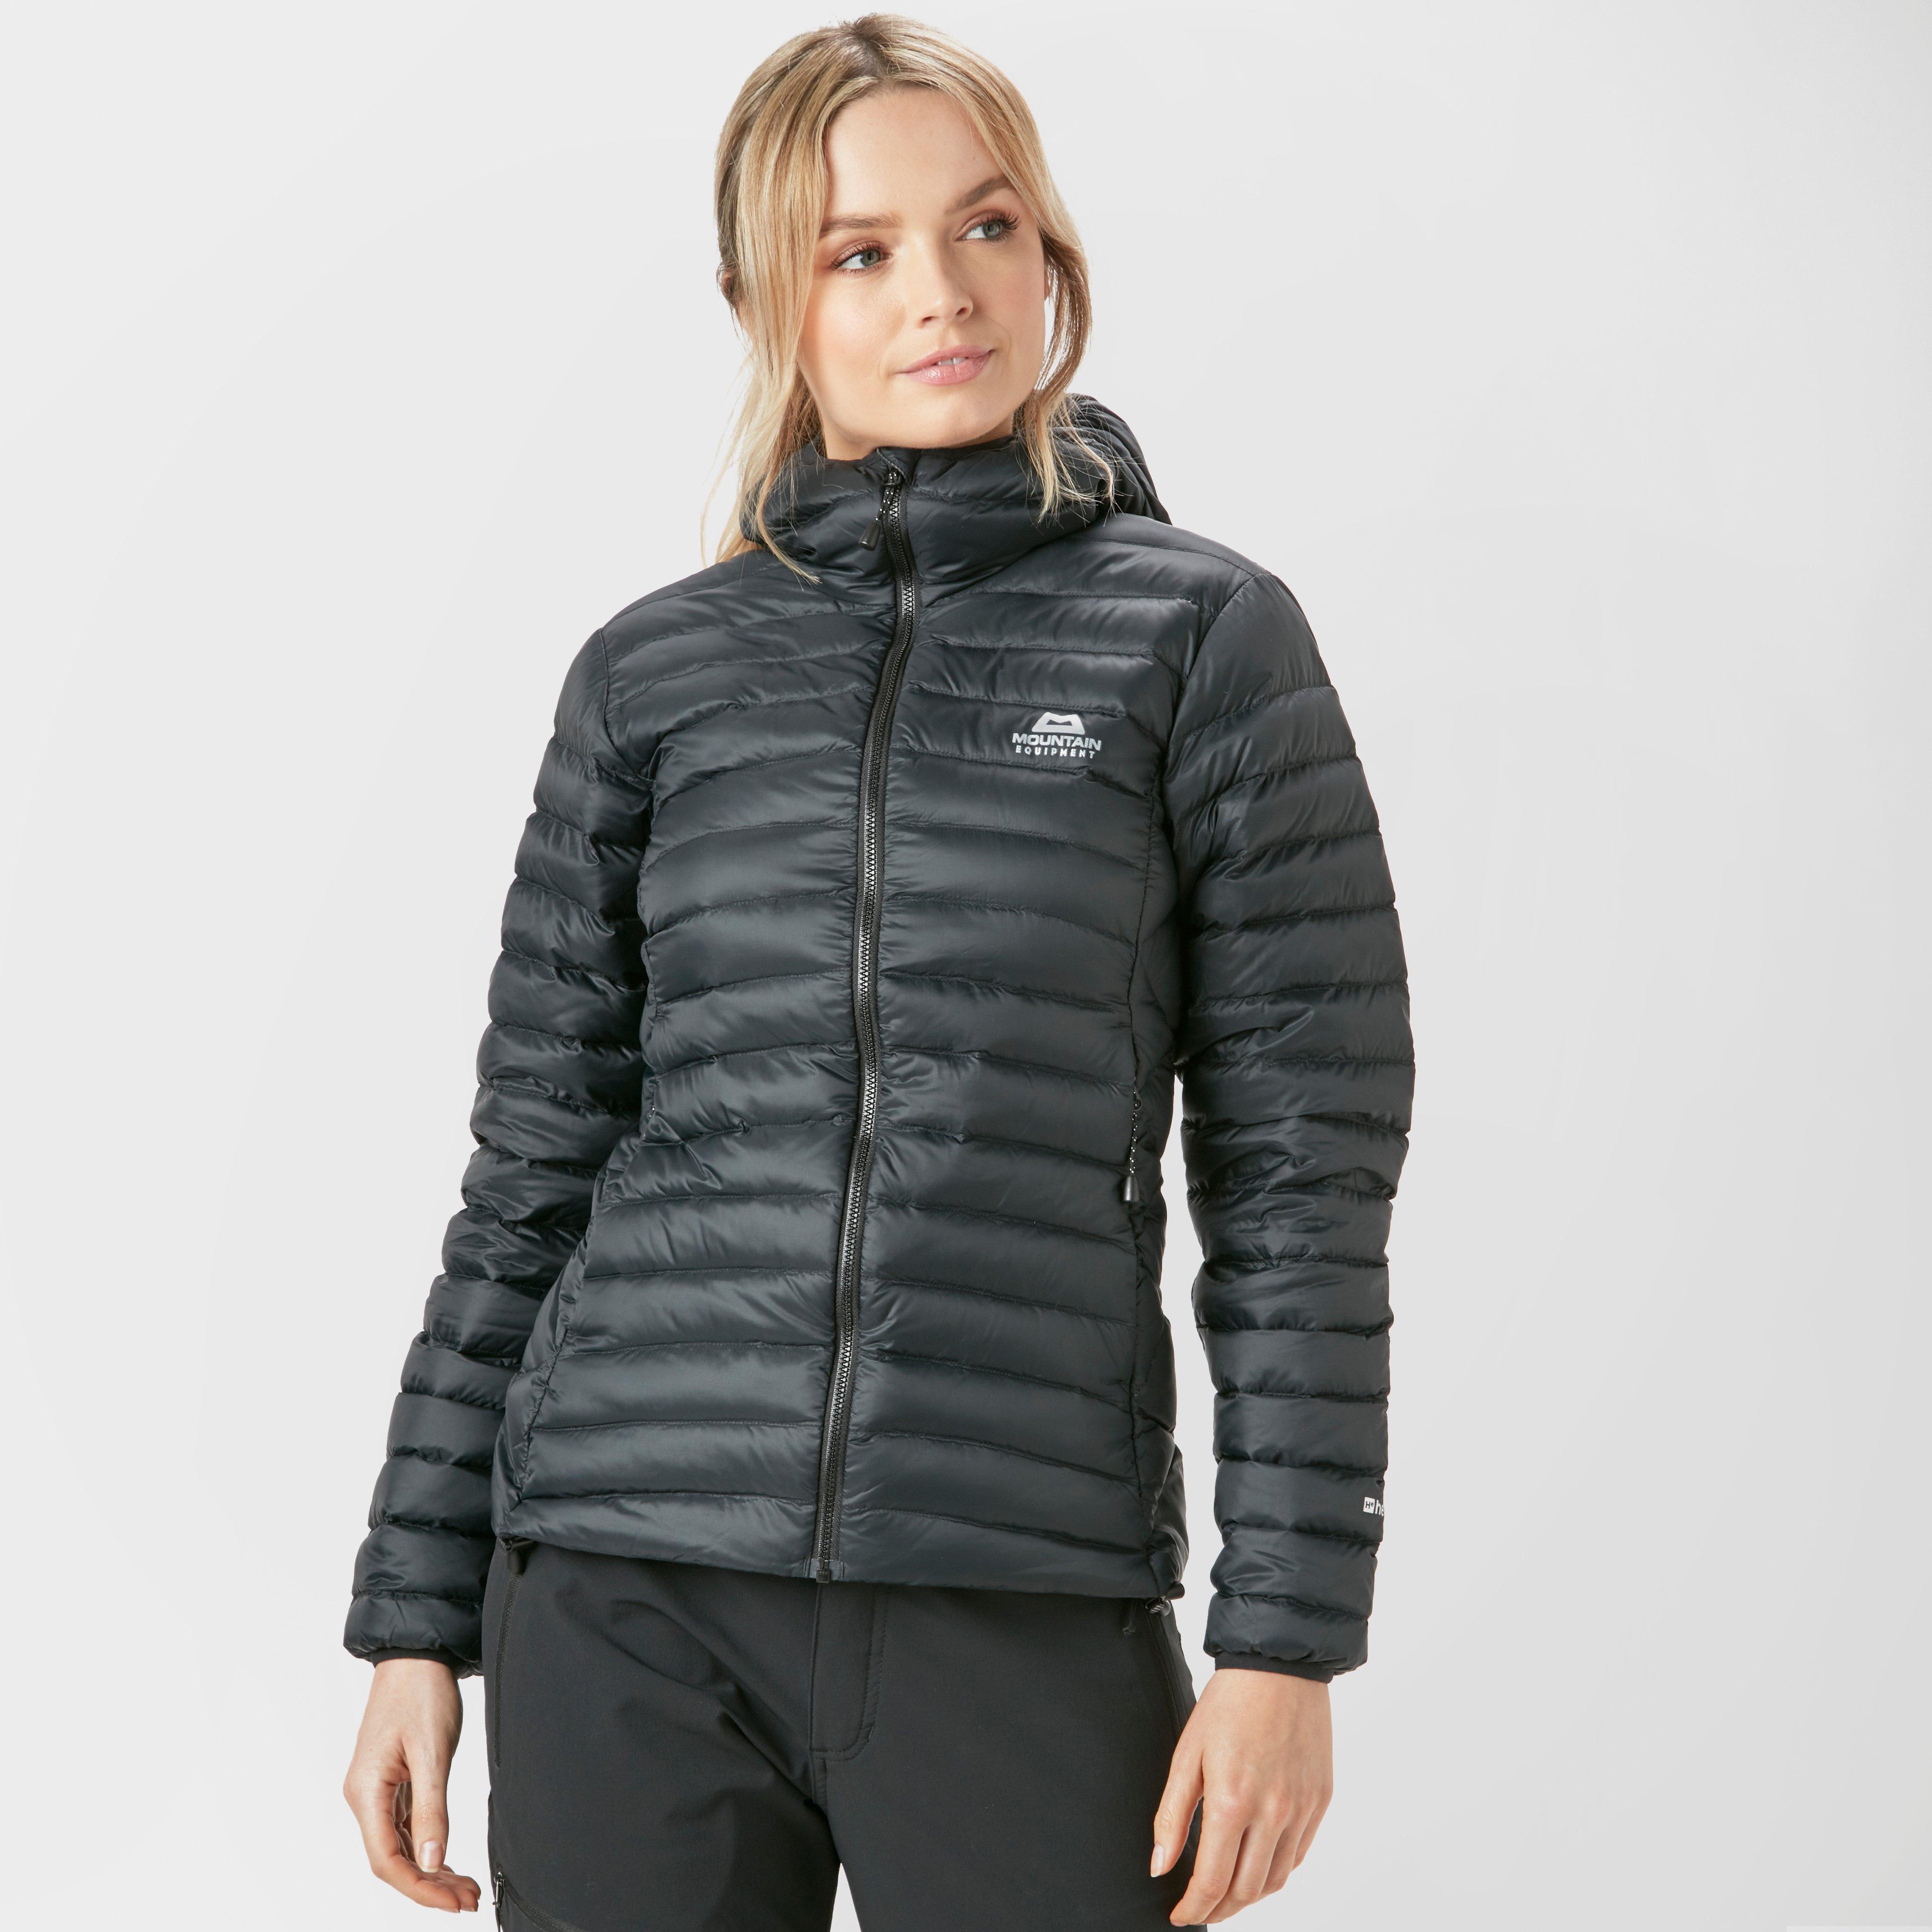 Mountain Equipment Women's Arete Hooded Down Jacket